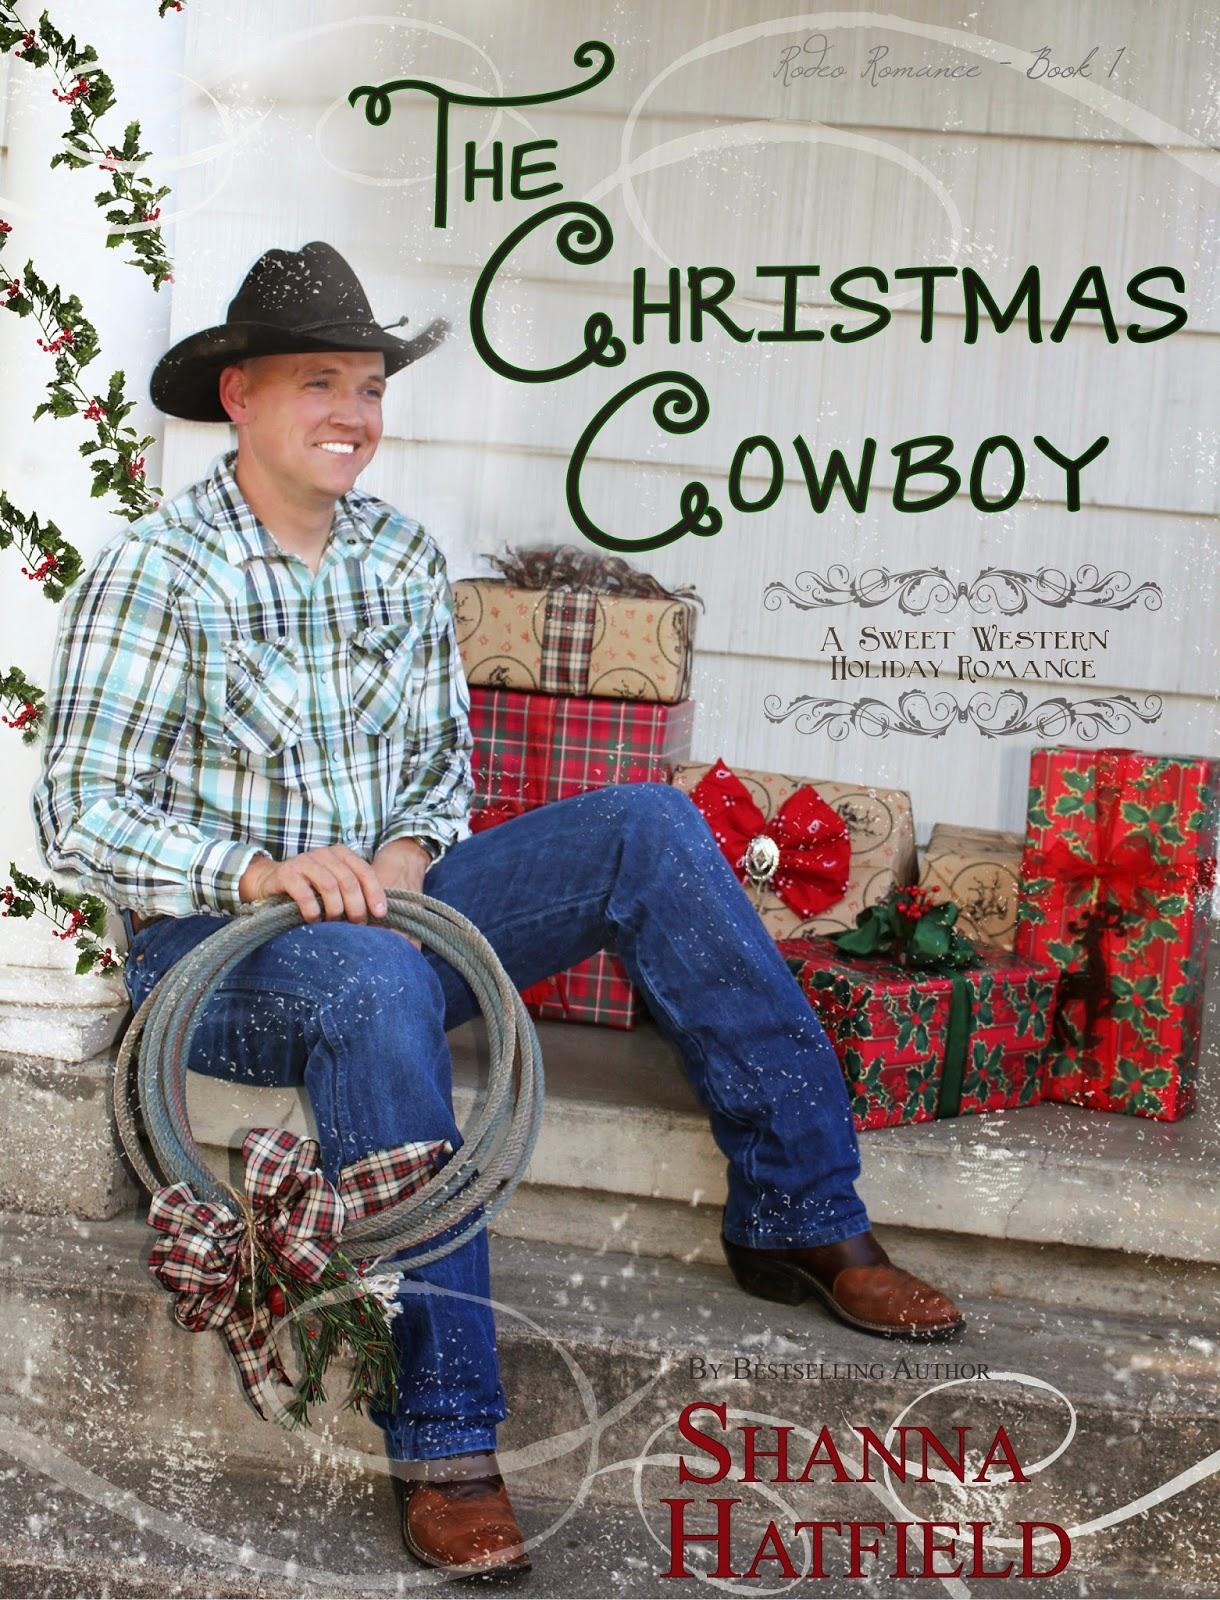 http://www.amazon.com/Christmas-Cowboy-Western-Holiday-Romance-ebook/dp/B00FYAXJXG/ref=sr_1_1?ie=UTF8&qid=1417629436&sr=8-1&keywords=the+christmas+cowboy